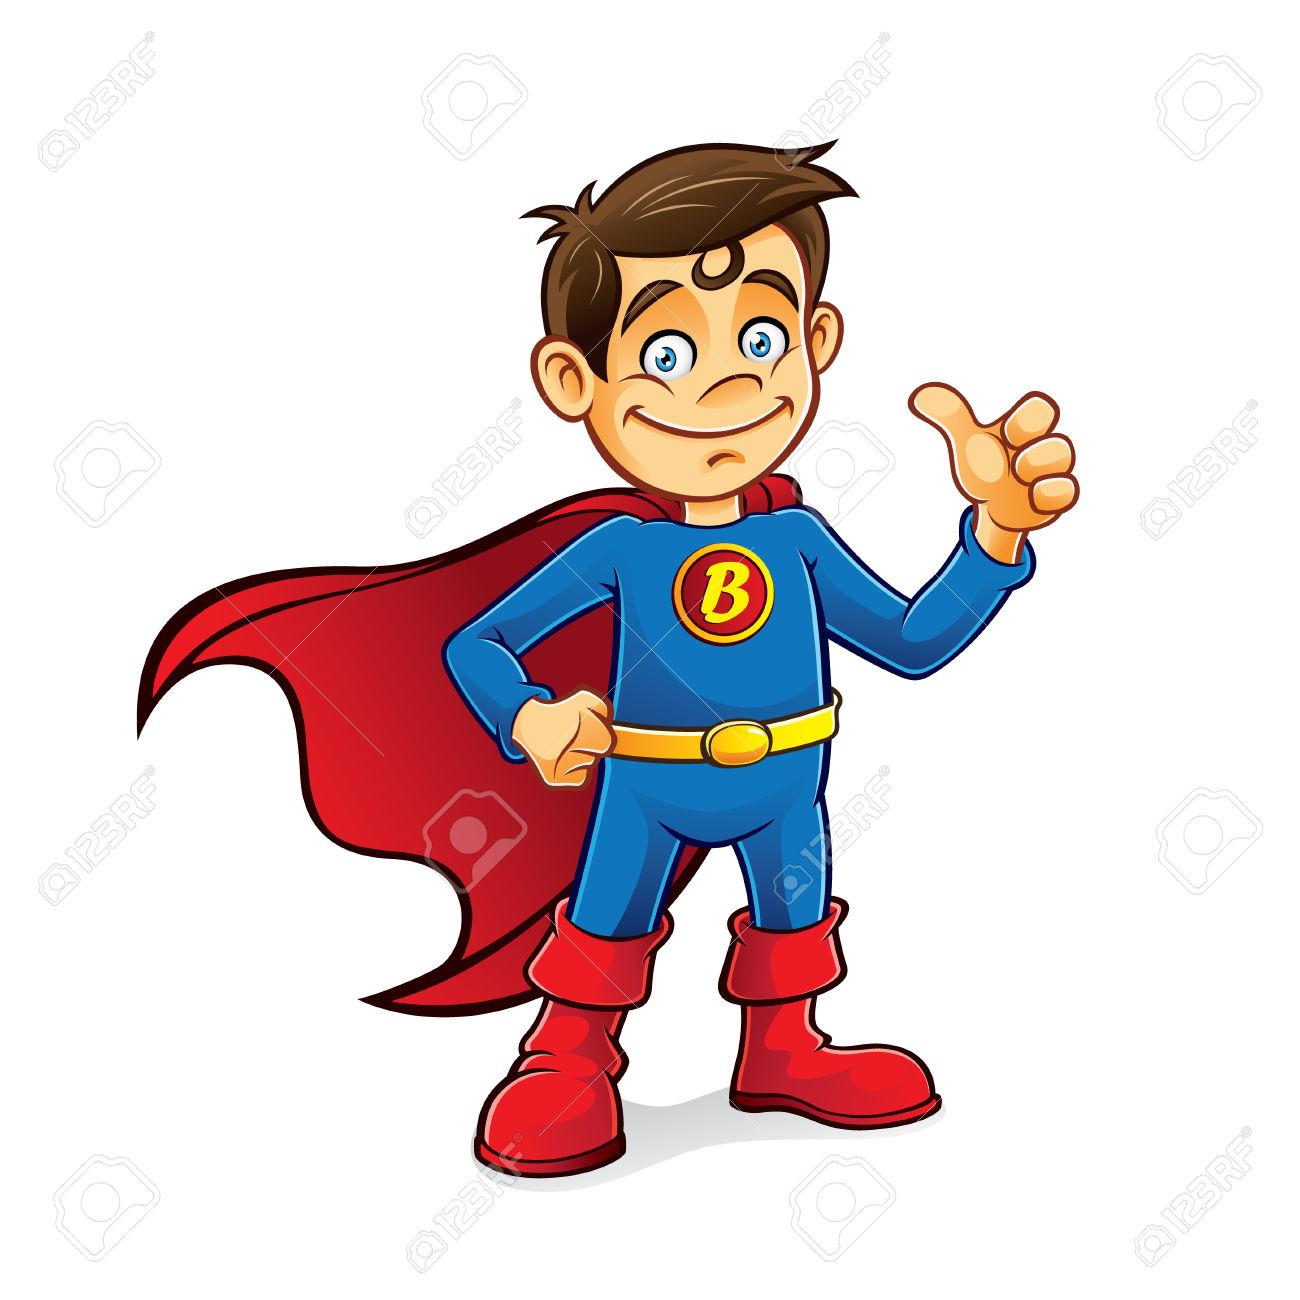 Superhero thumbs up clipart